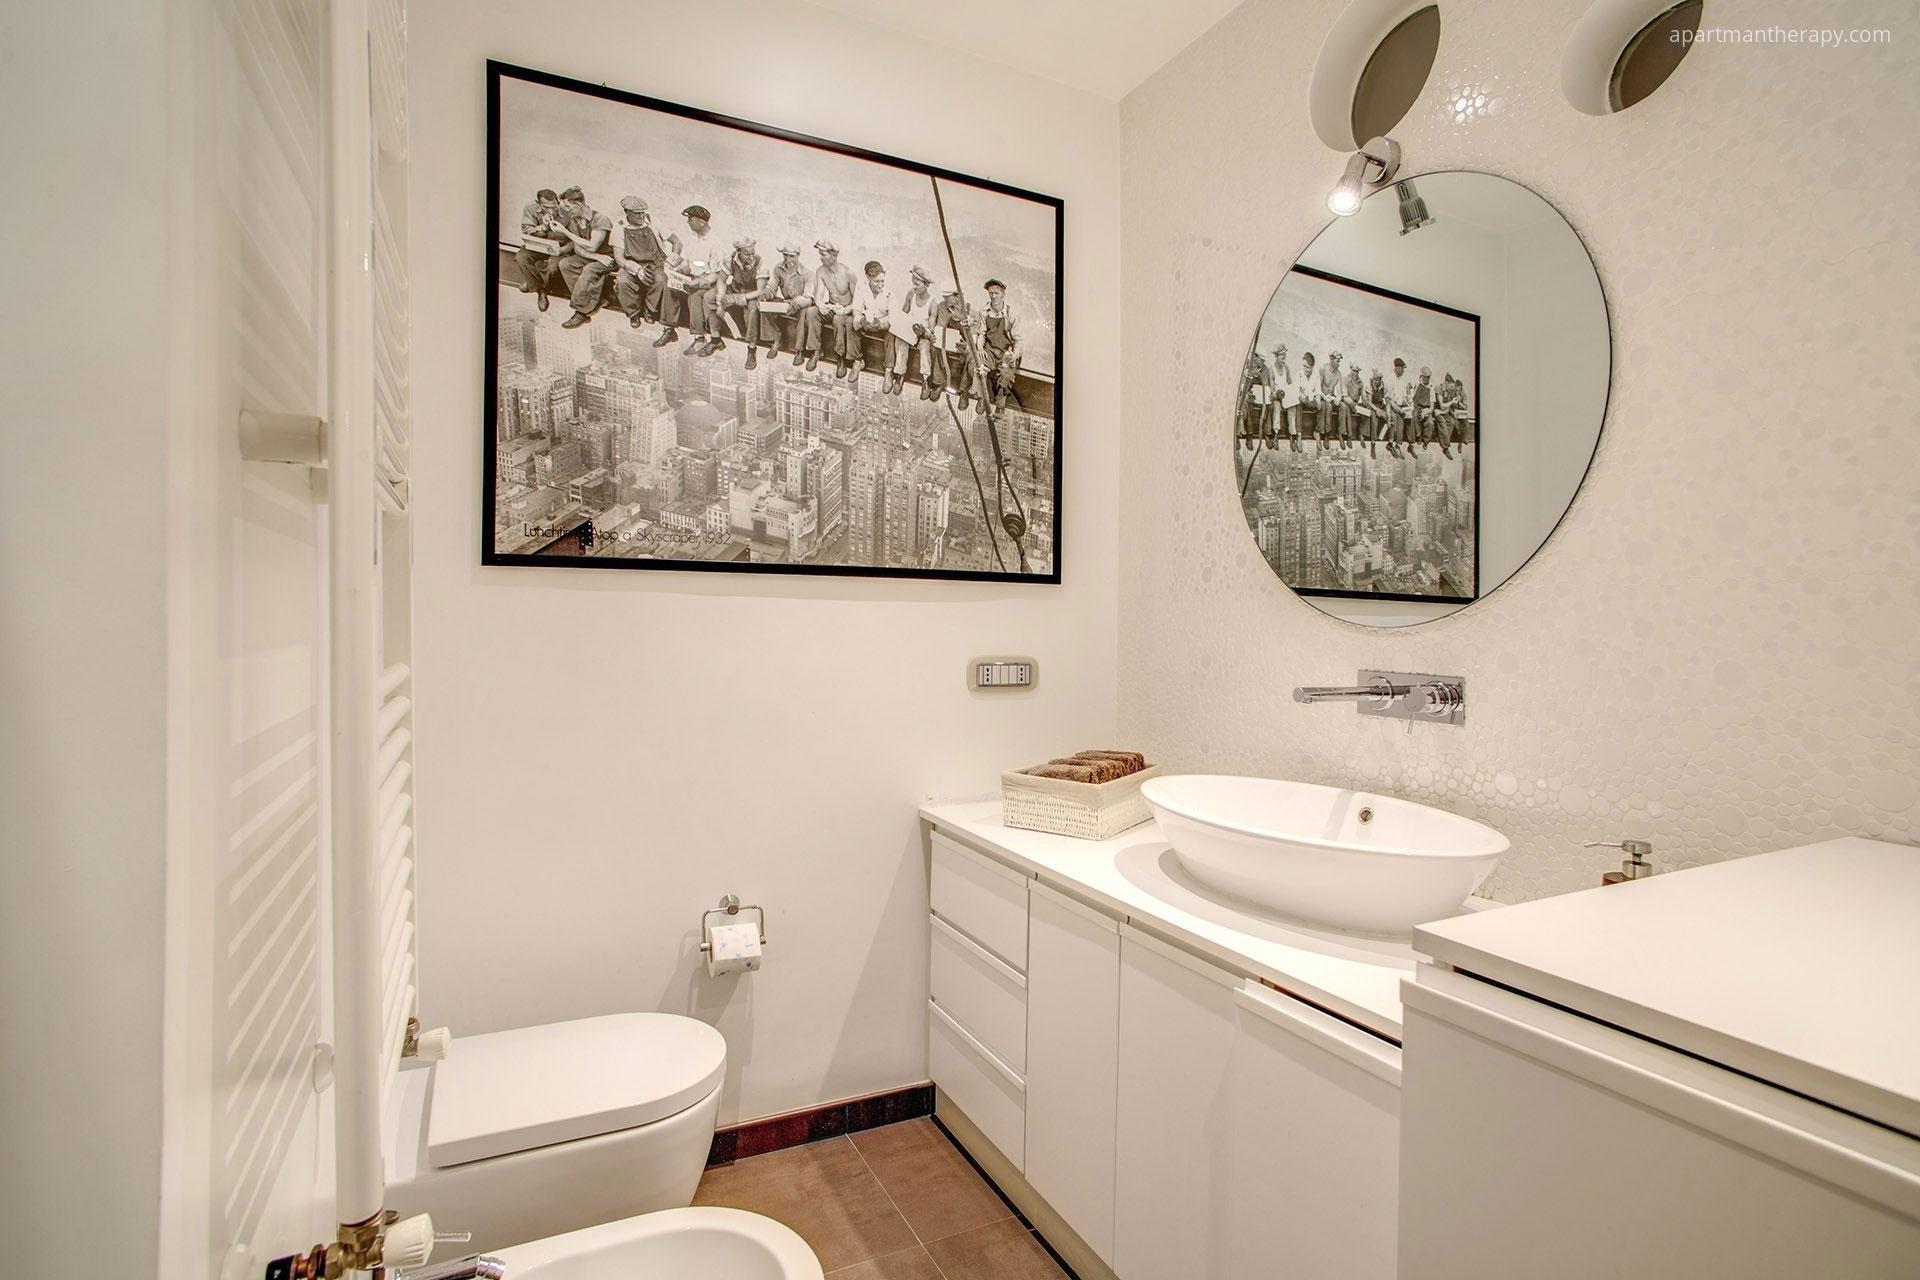 Kicsi fürdőszoba // HOMEINFO.hu - Inspirációtár